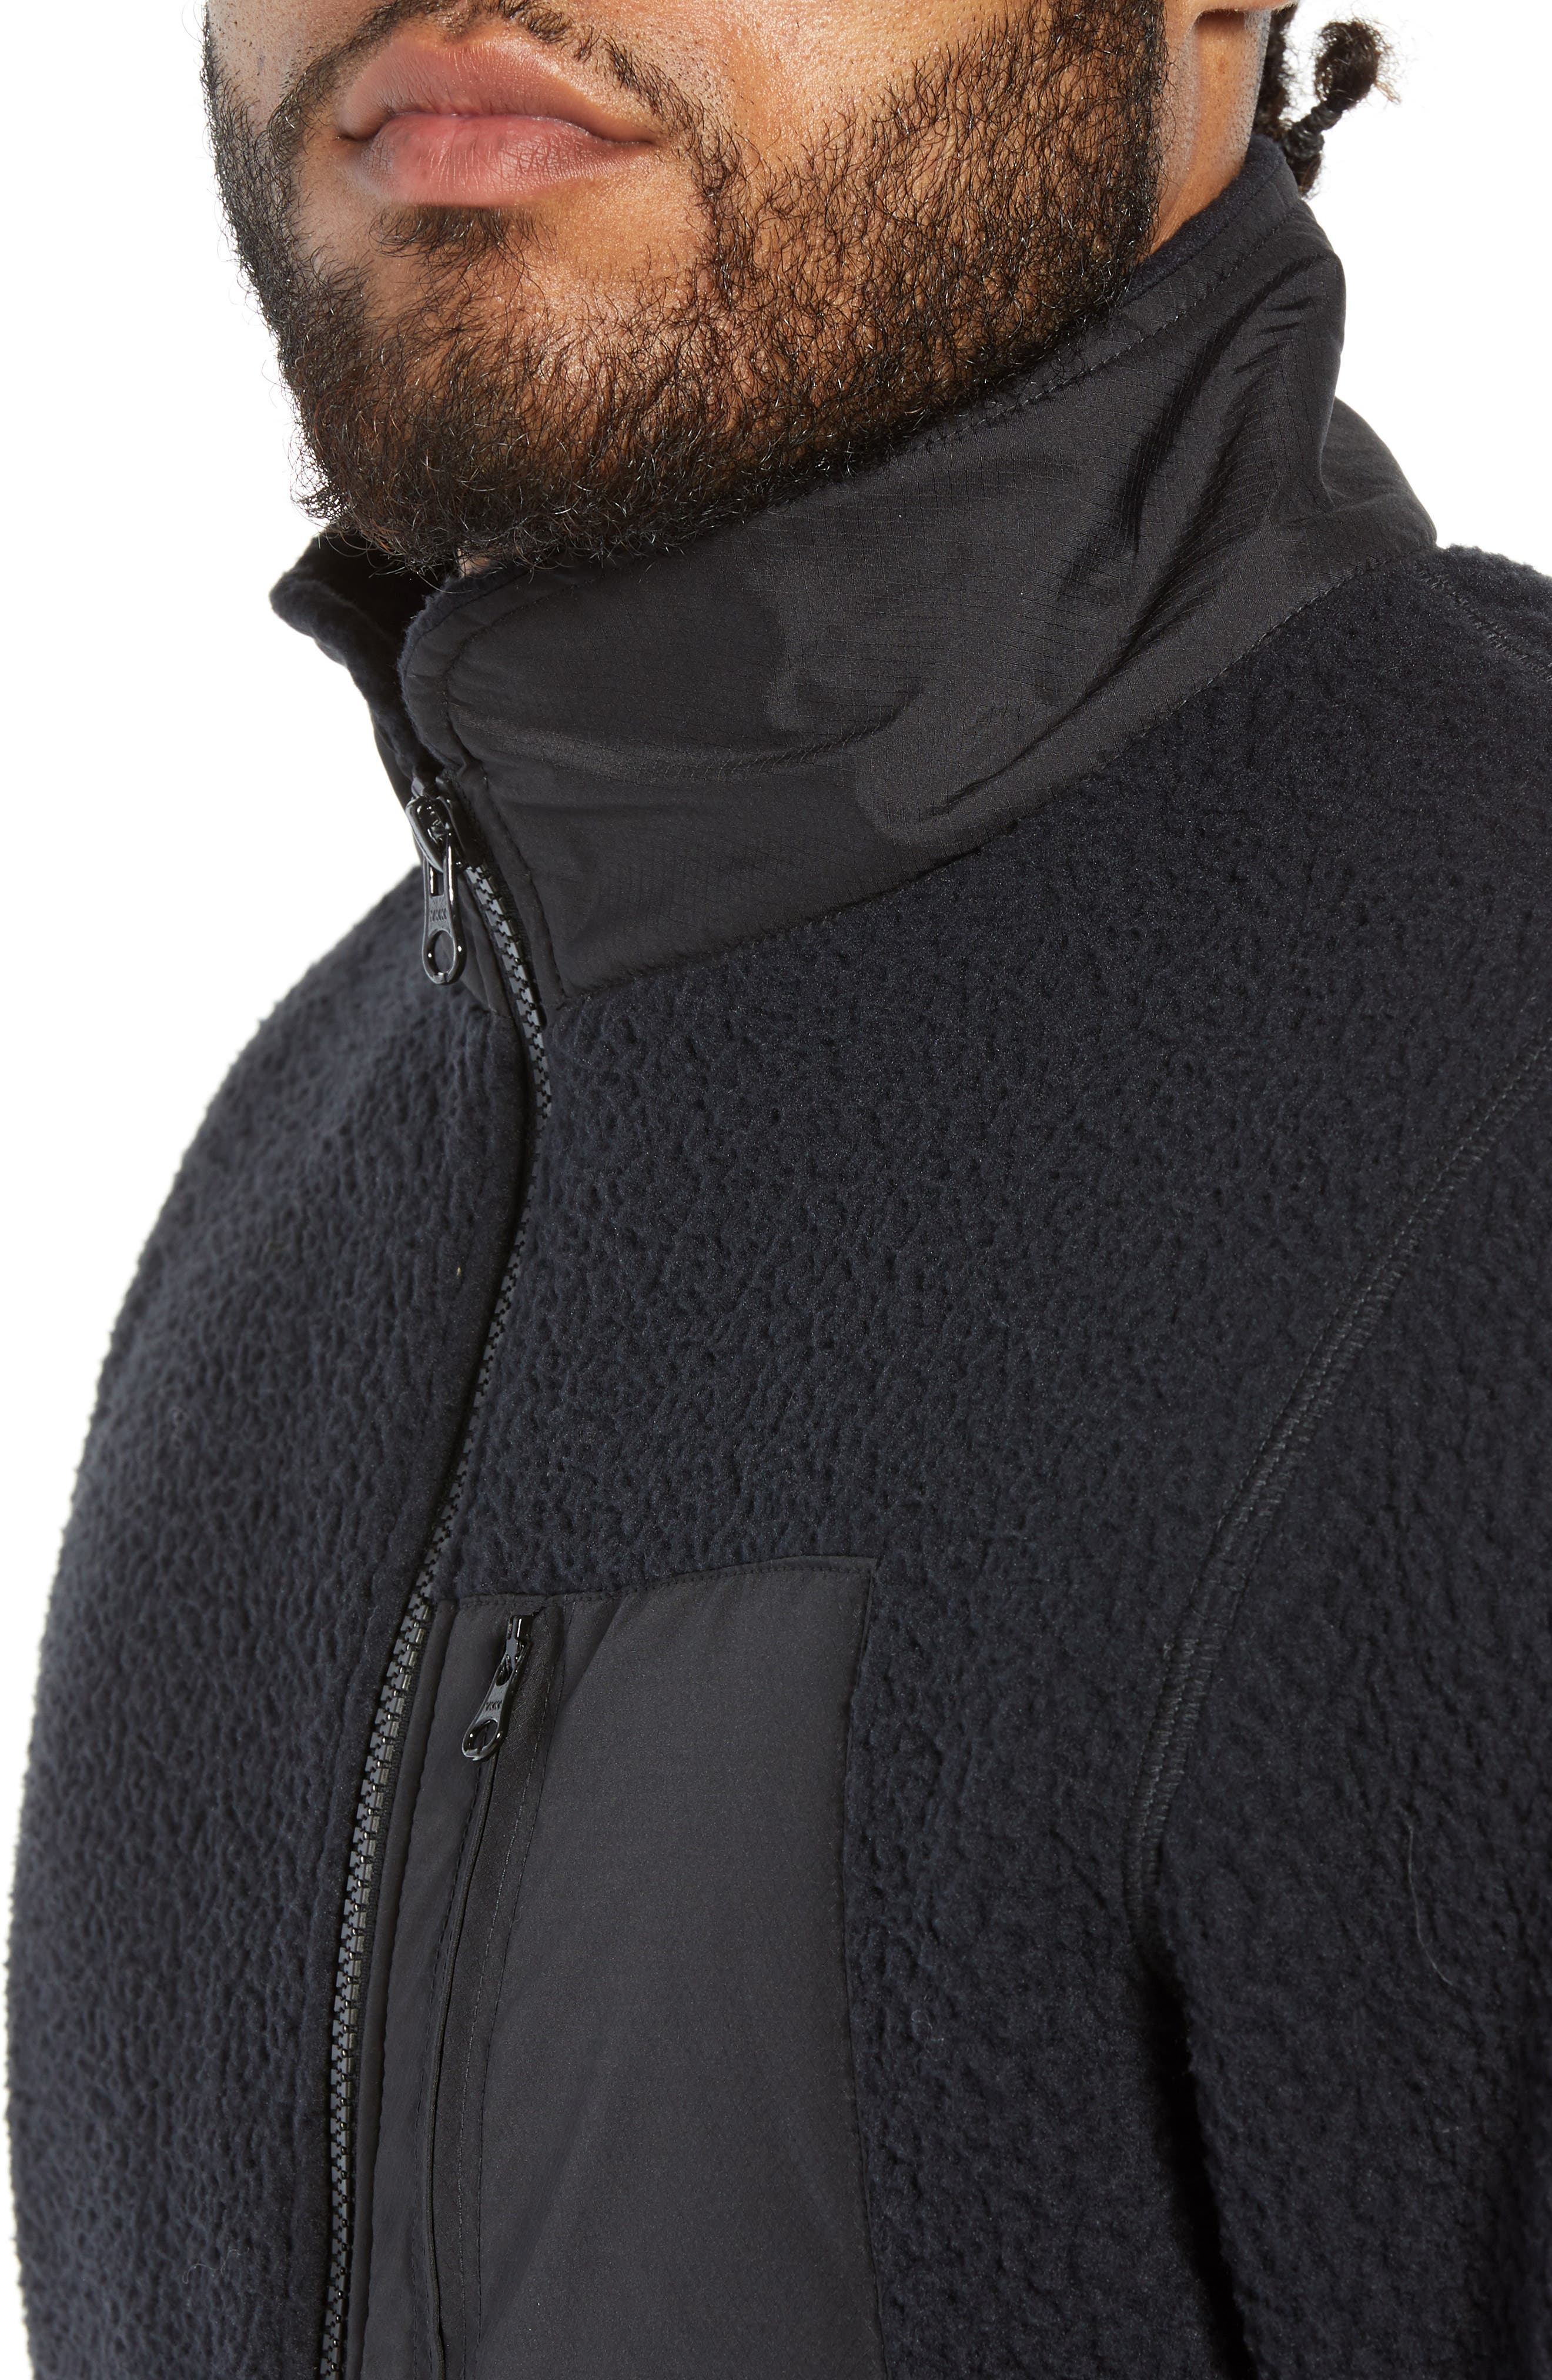 HERSCHEL SUPPLY CO.,                             Tech Fleece Jacket,                             Alternate thumbnail 4, color,                             001